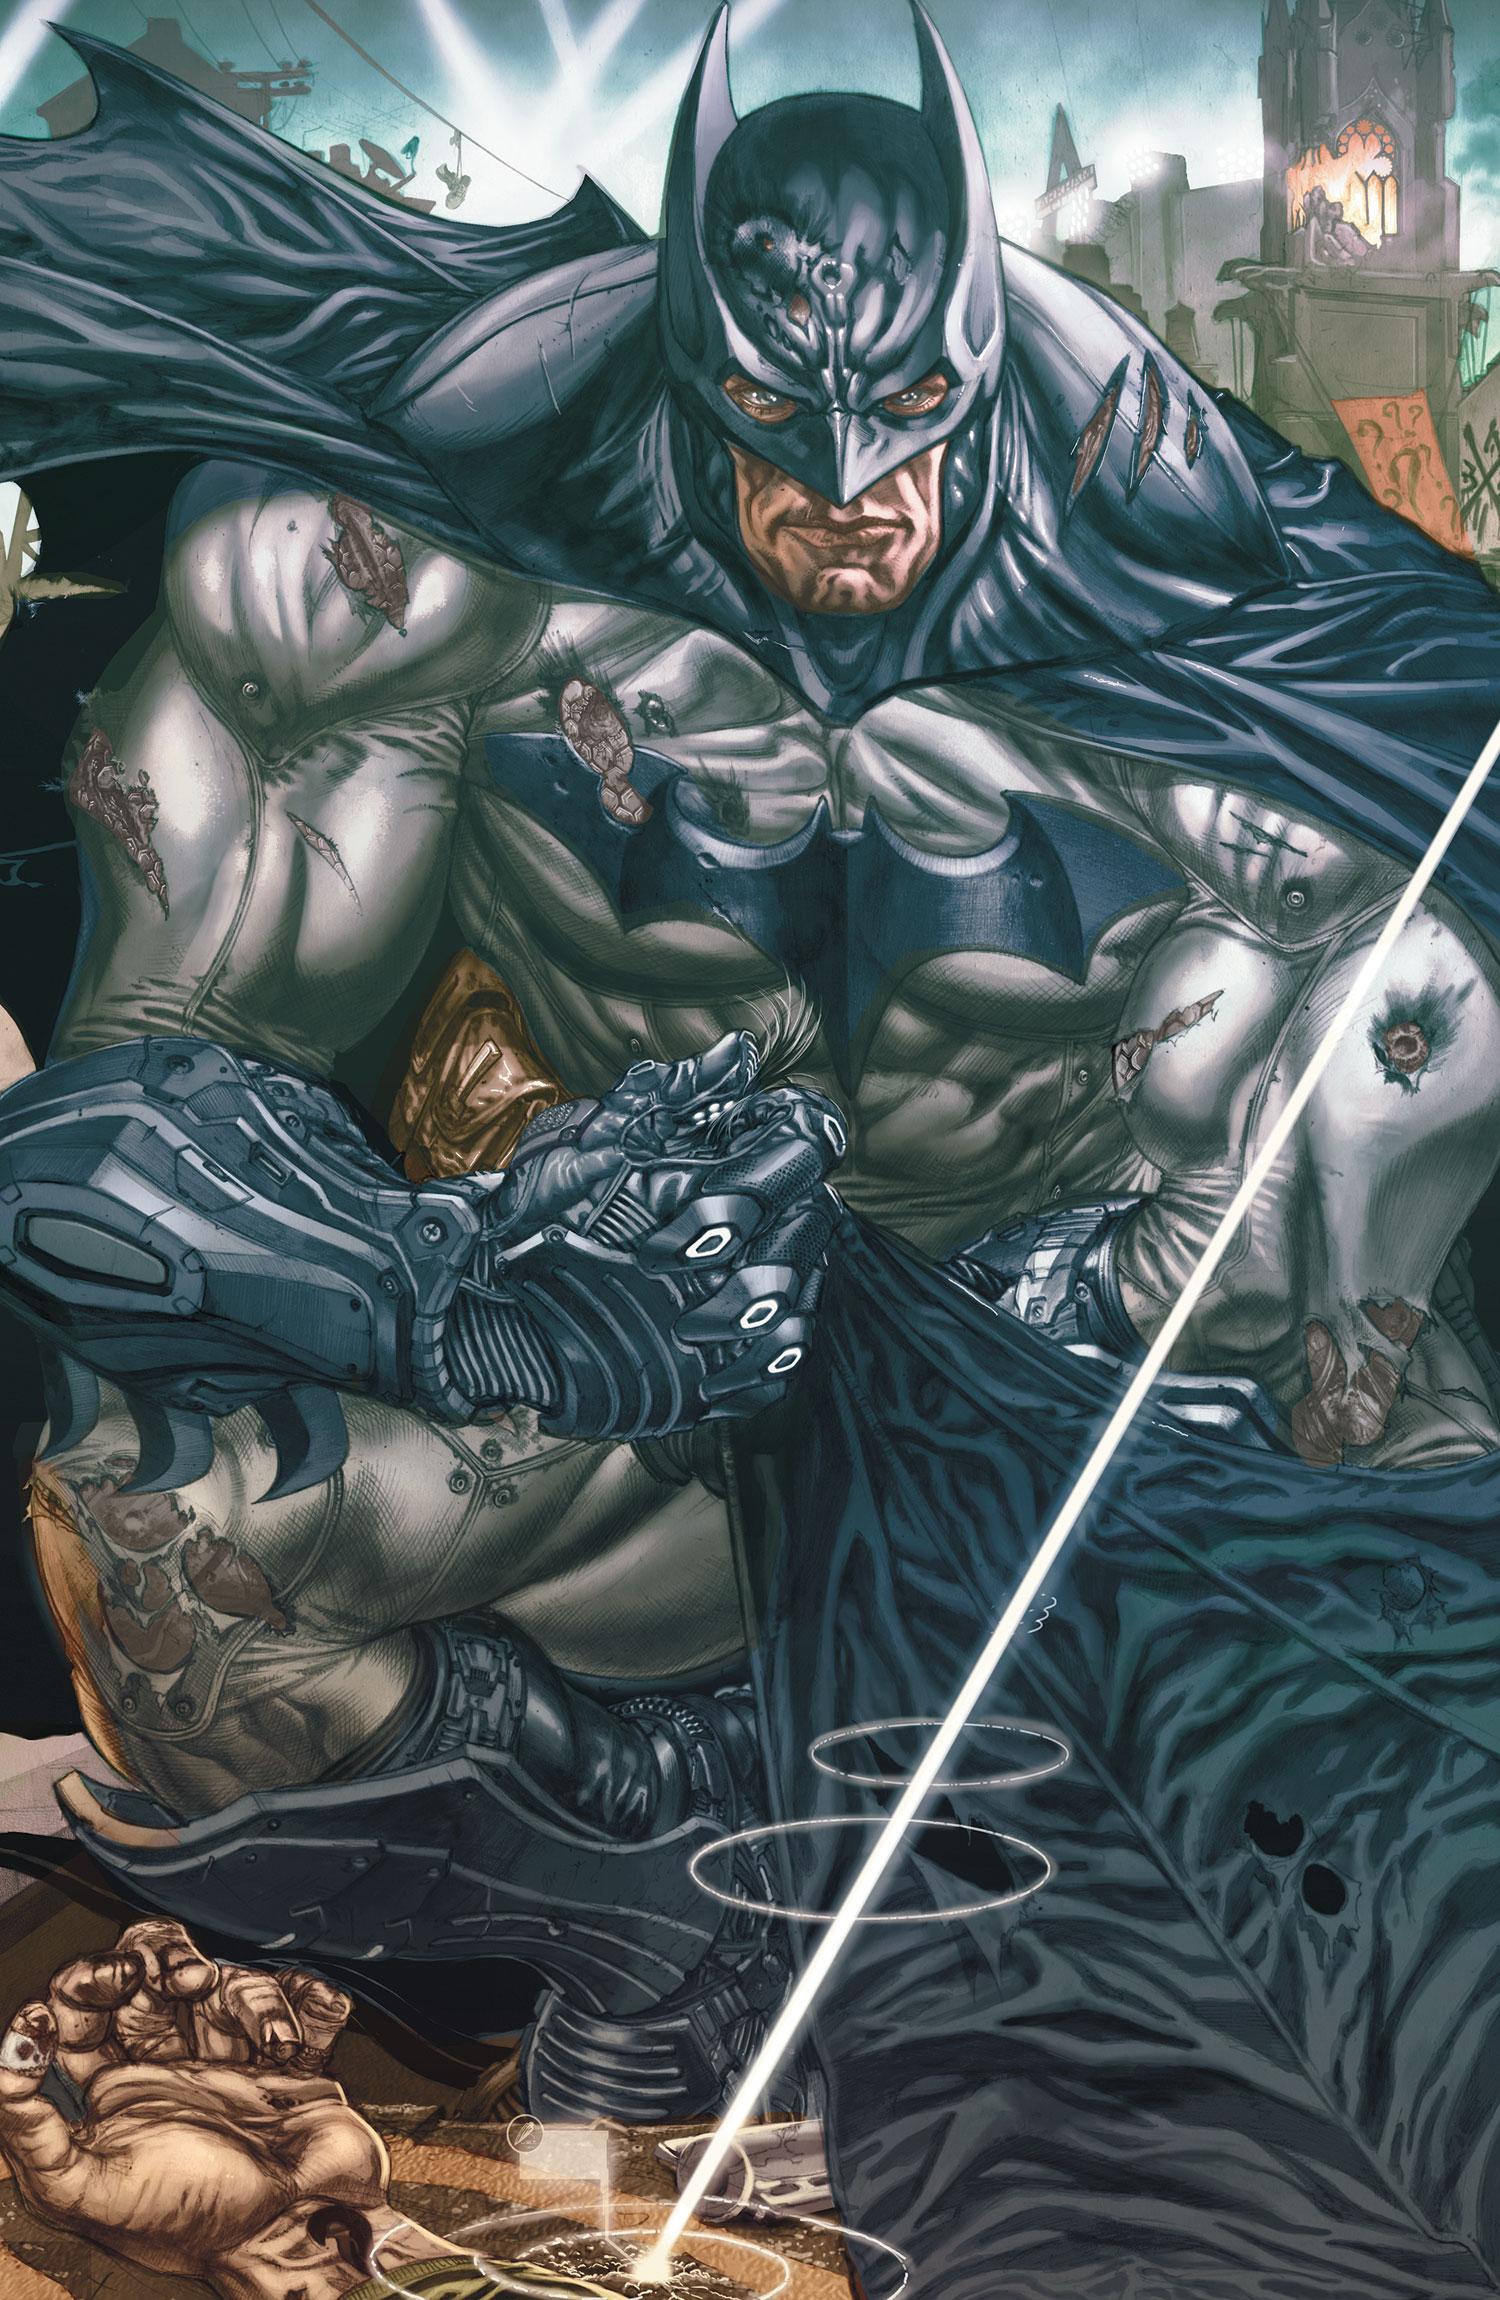 Batman: Arkham Unhinged Backgrounds on Wallpapers Vista